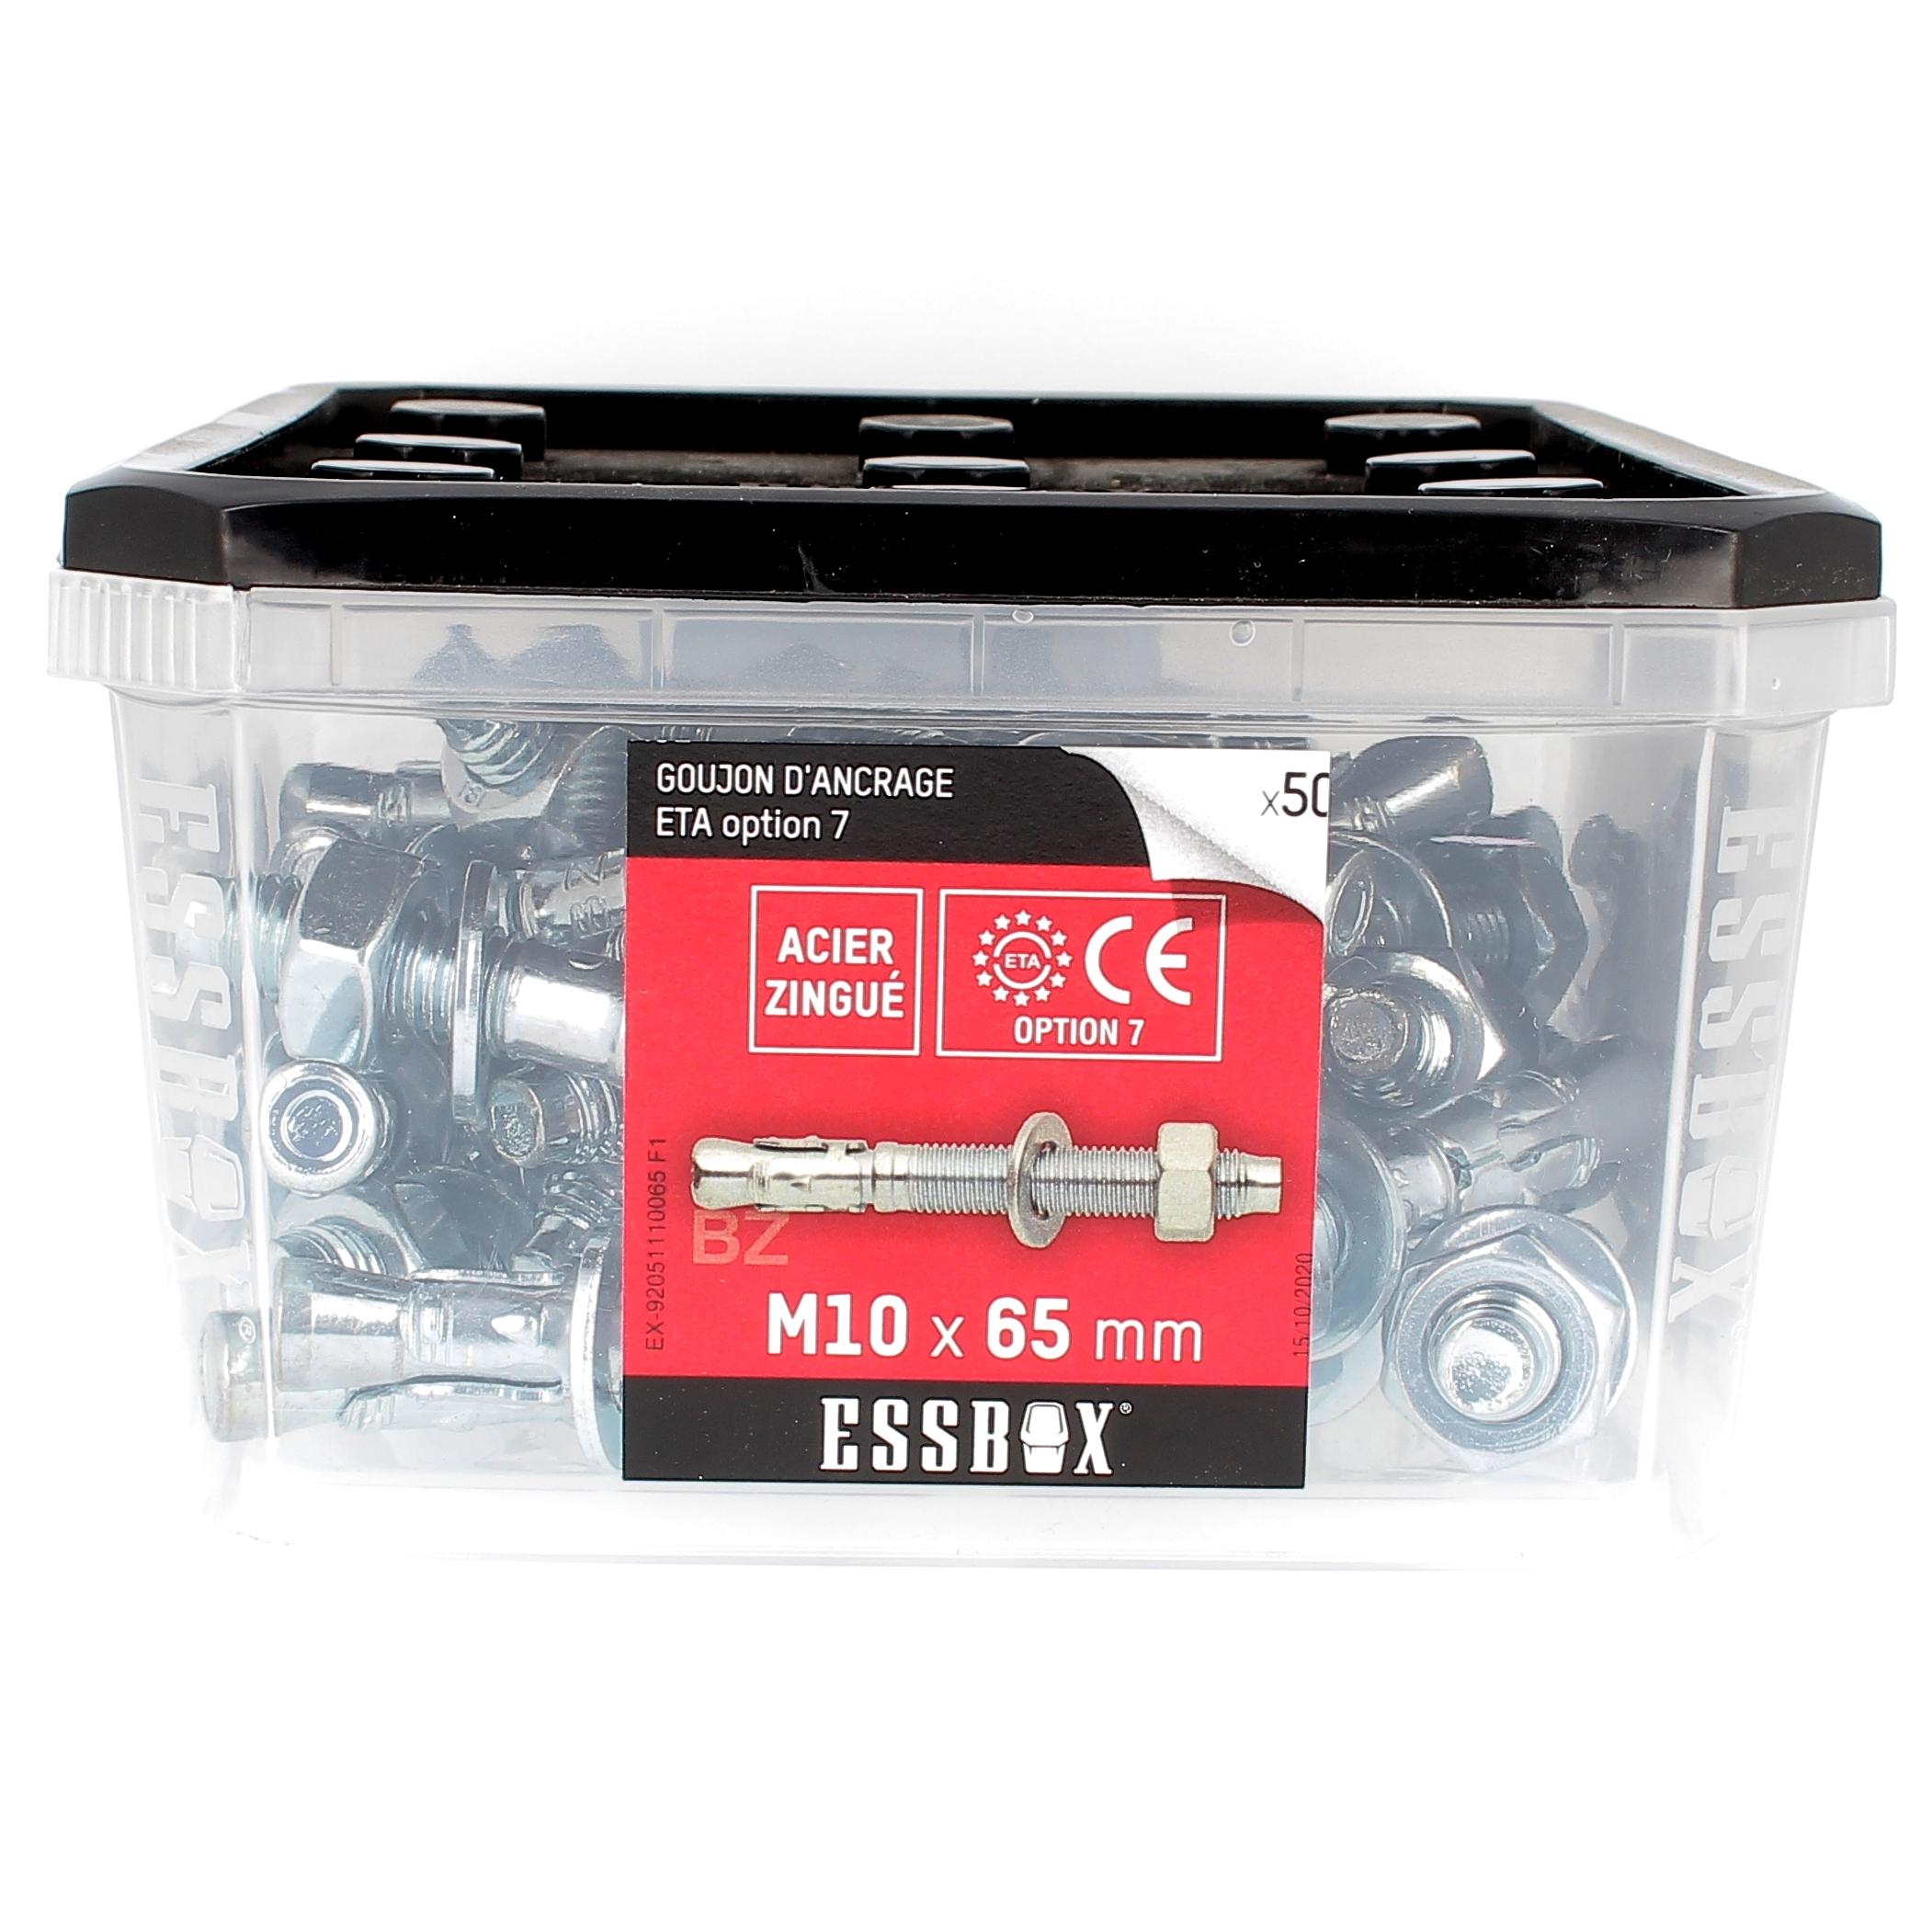 ESSBOX de 50 Goujons D'Ancrage 10X65 Acier